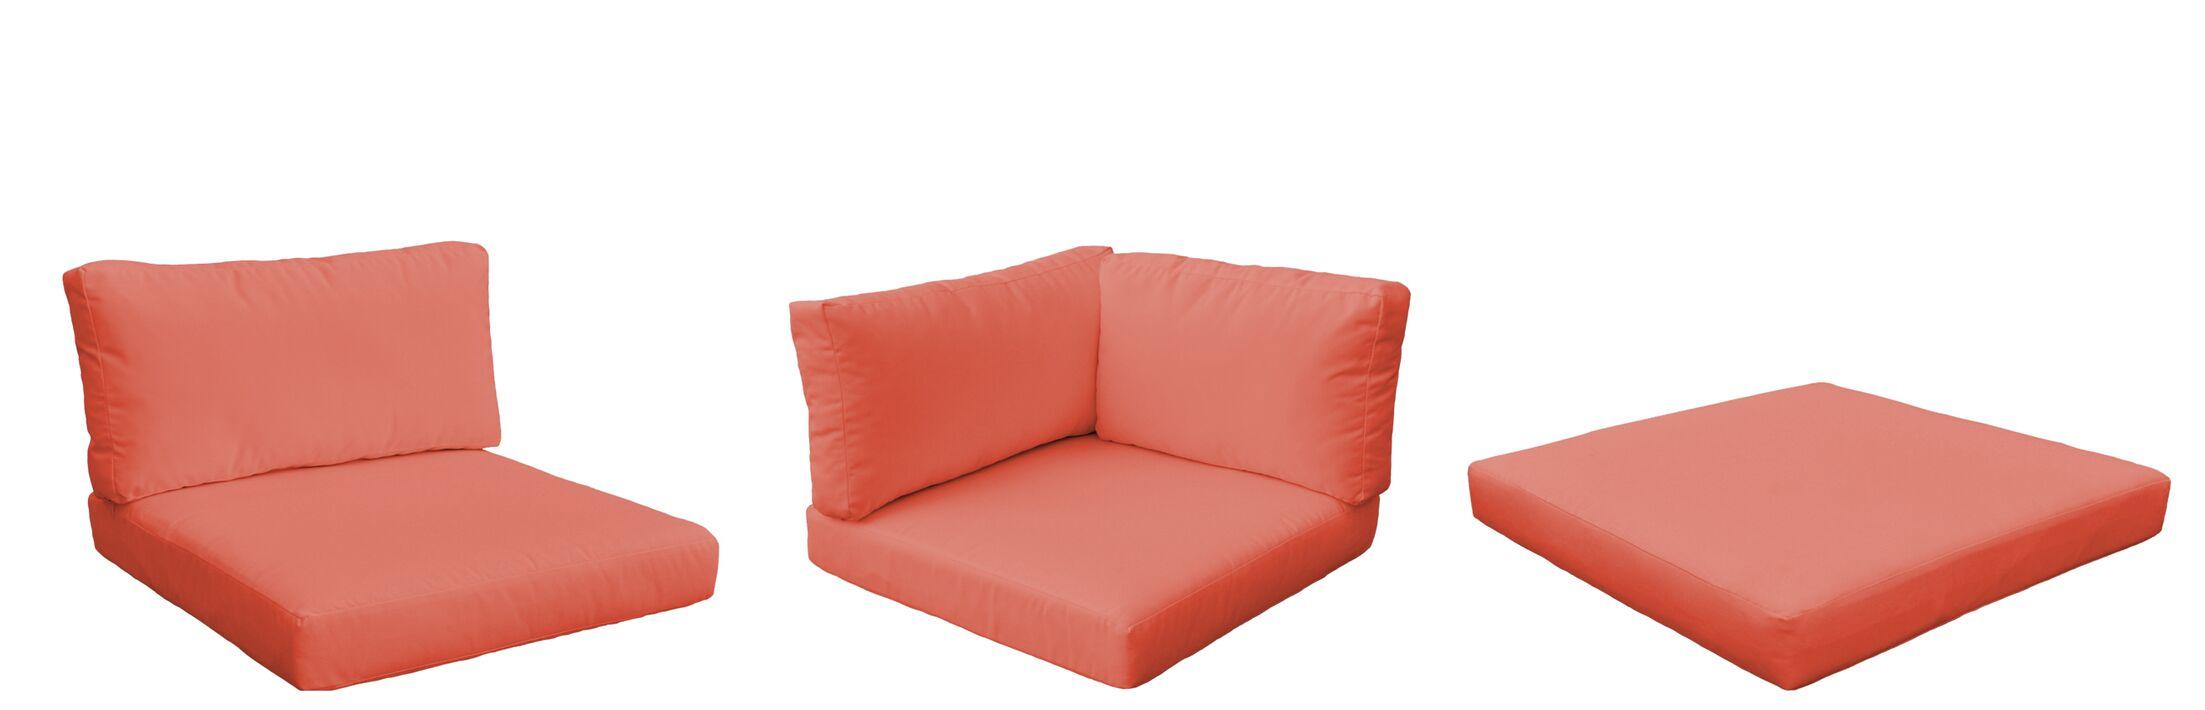 Belle 18 Piece Outdoor Lounge Chair Cushion Set Fabric: Tangerine